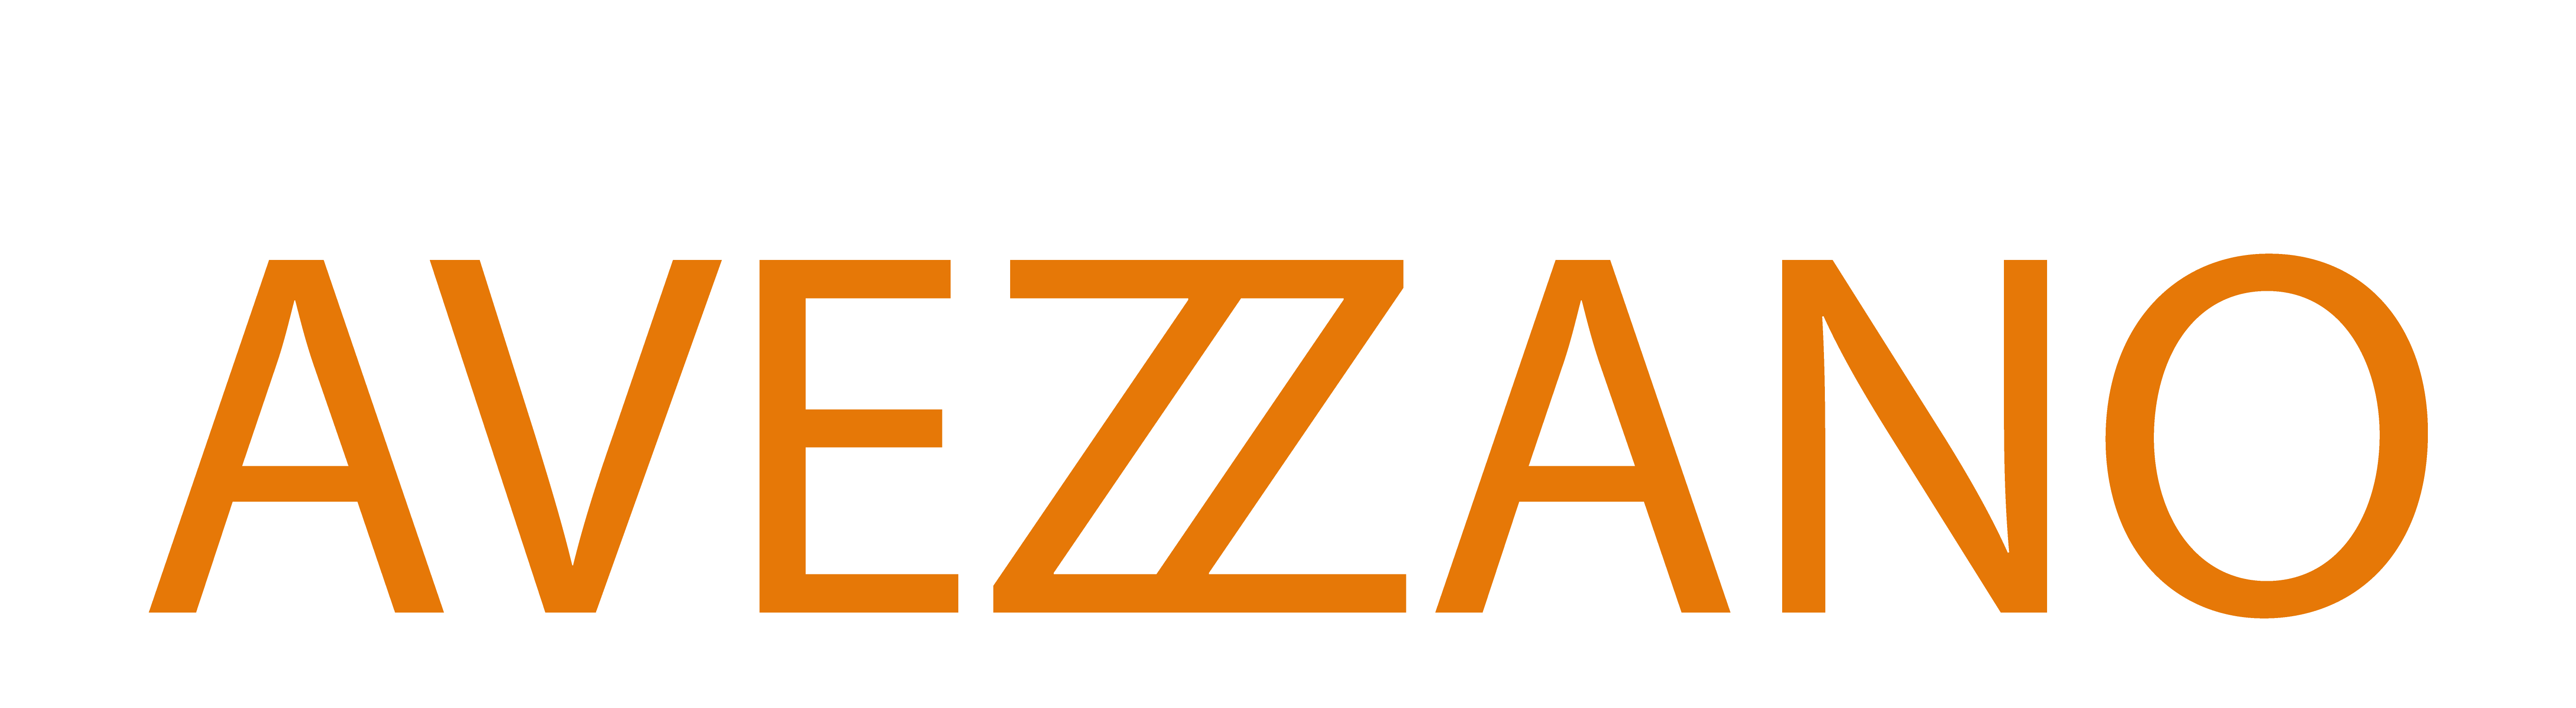 AVEZZANO